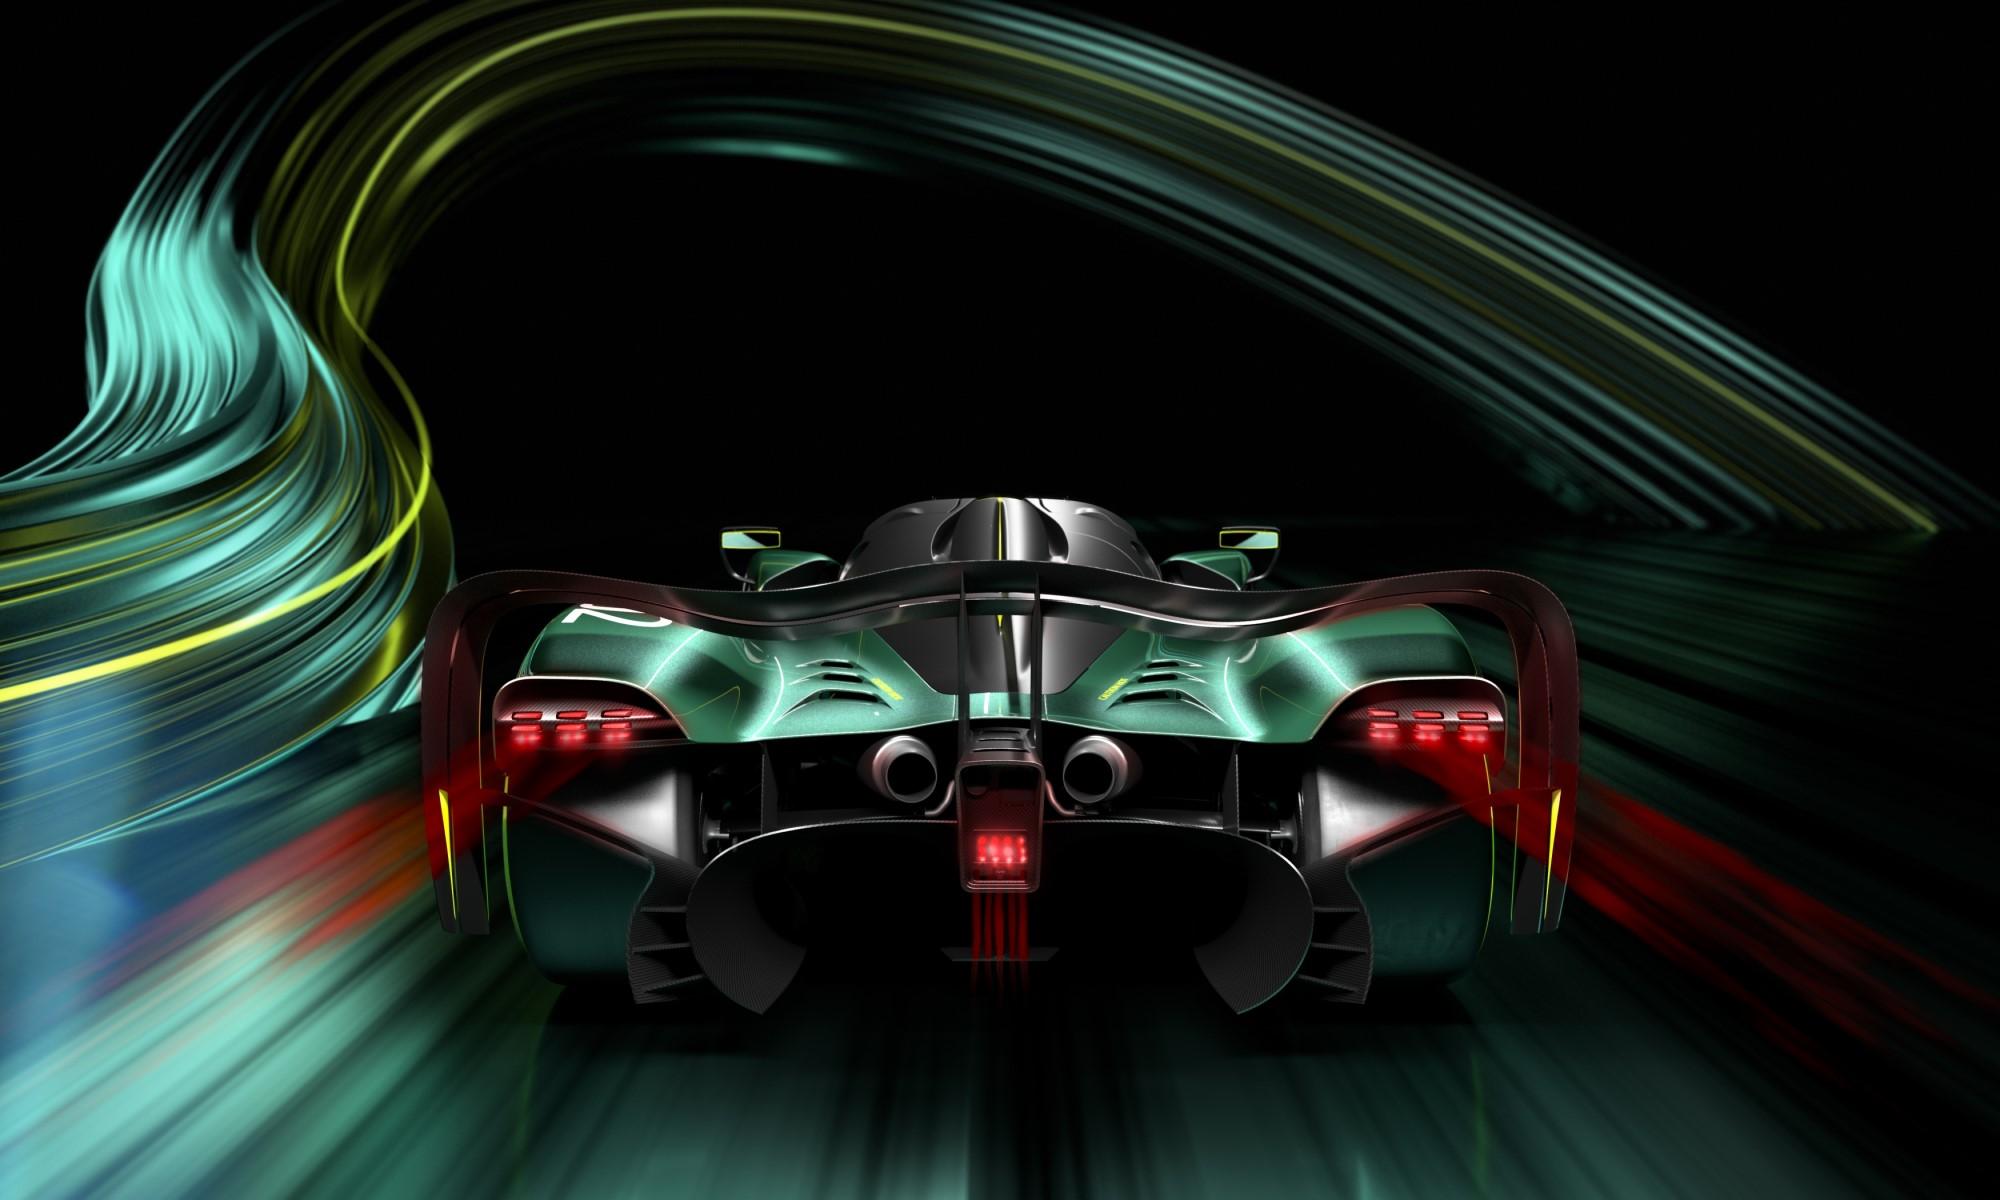 Valkyrie AMR Pro rear